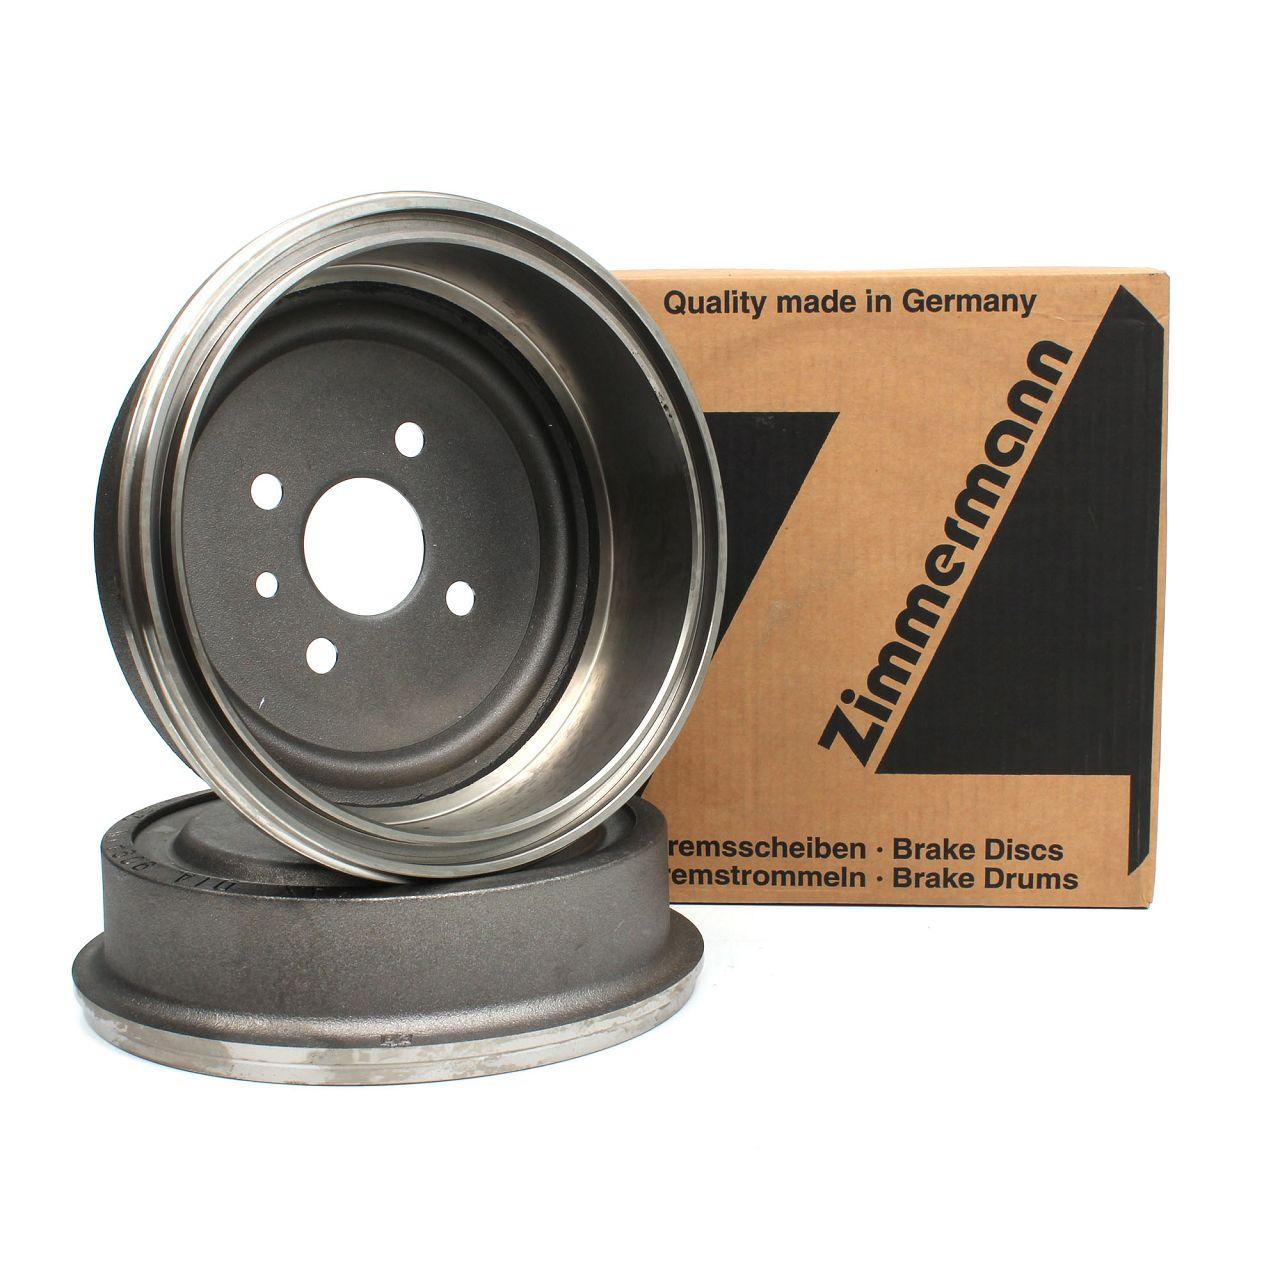 ZIMMERMANN Bremstrommeln für Opel Ascona Combo GT Kadett Manta Rekord hinten